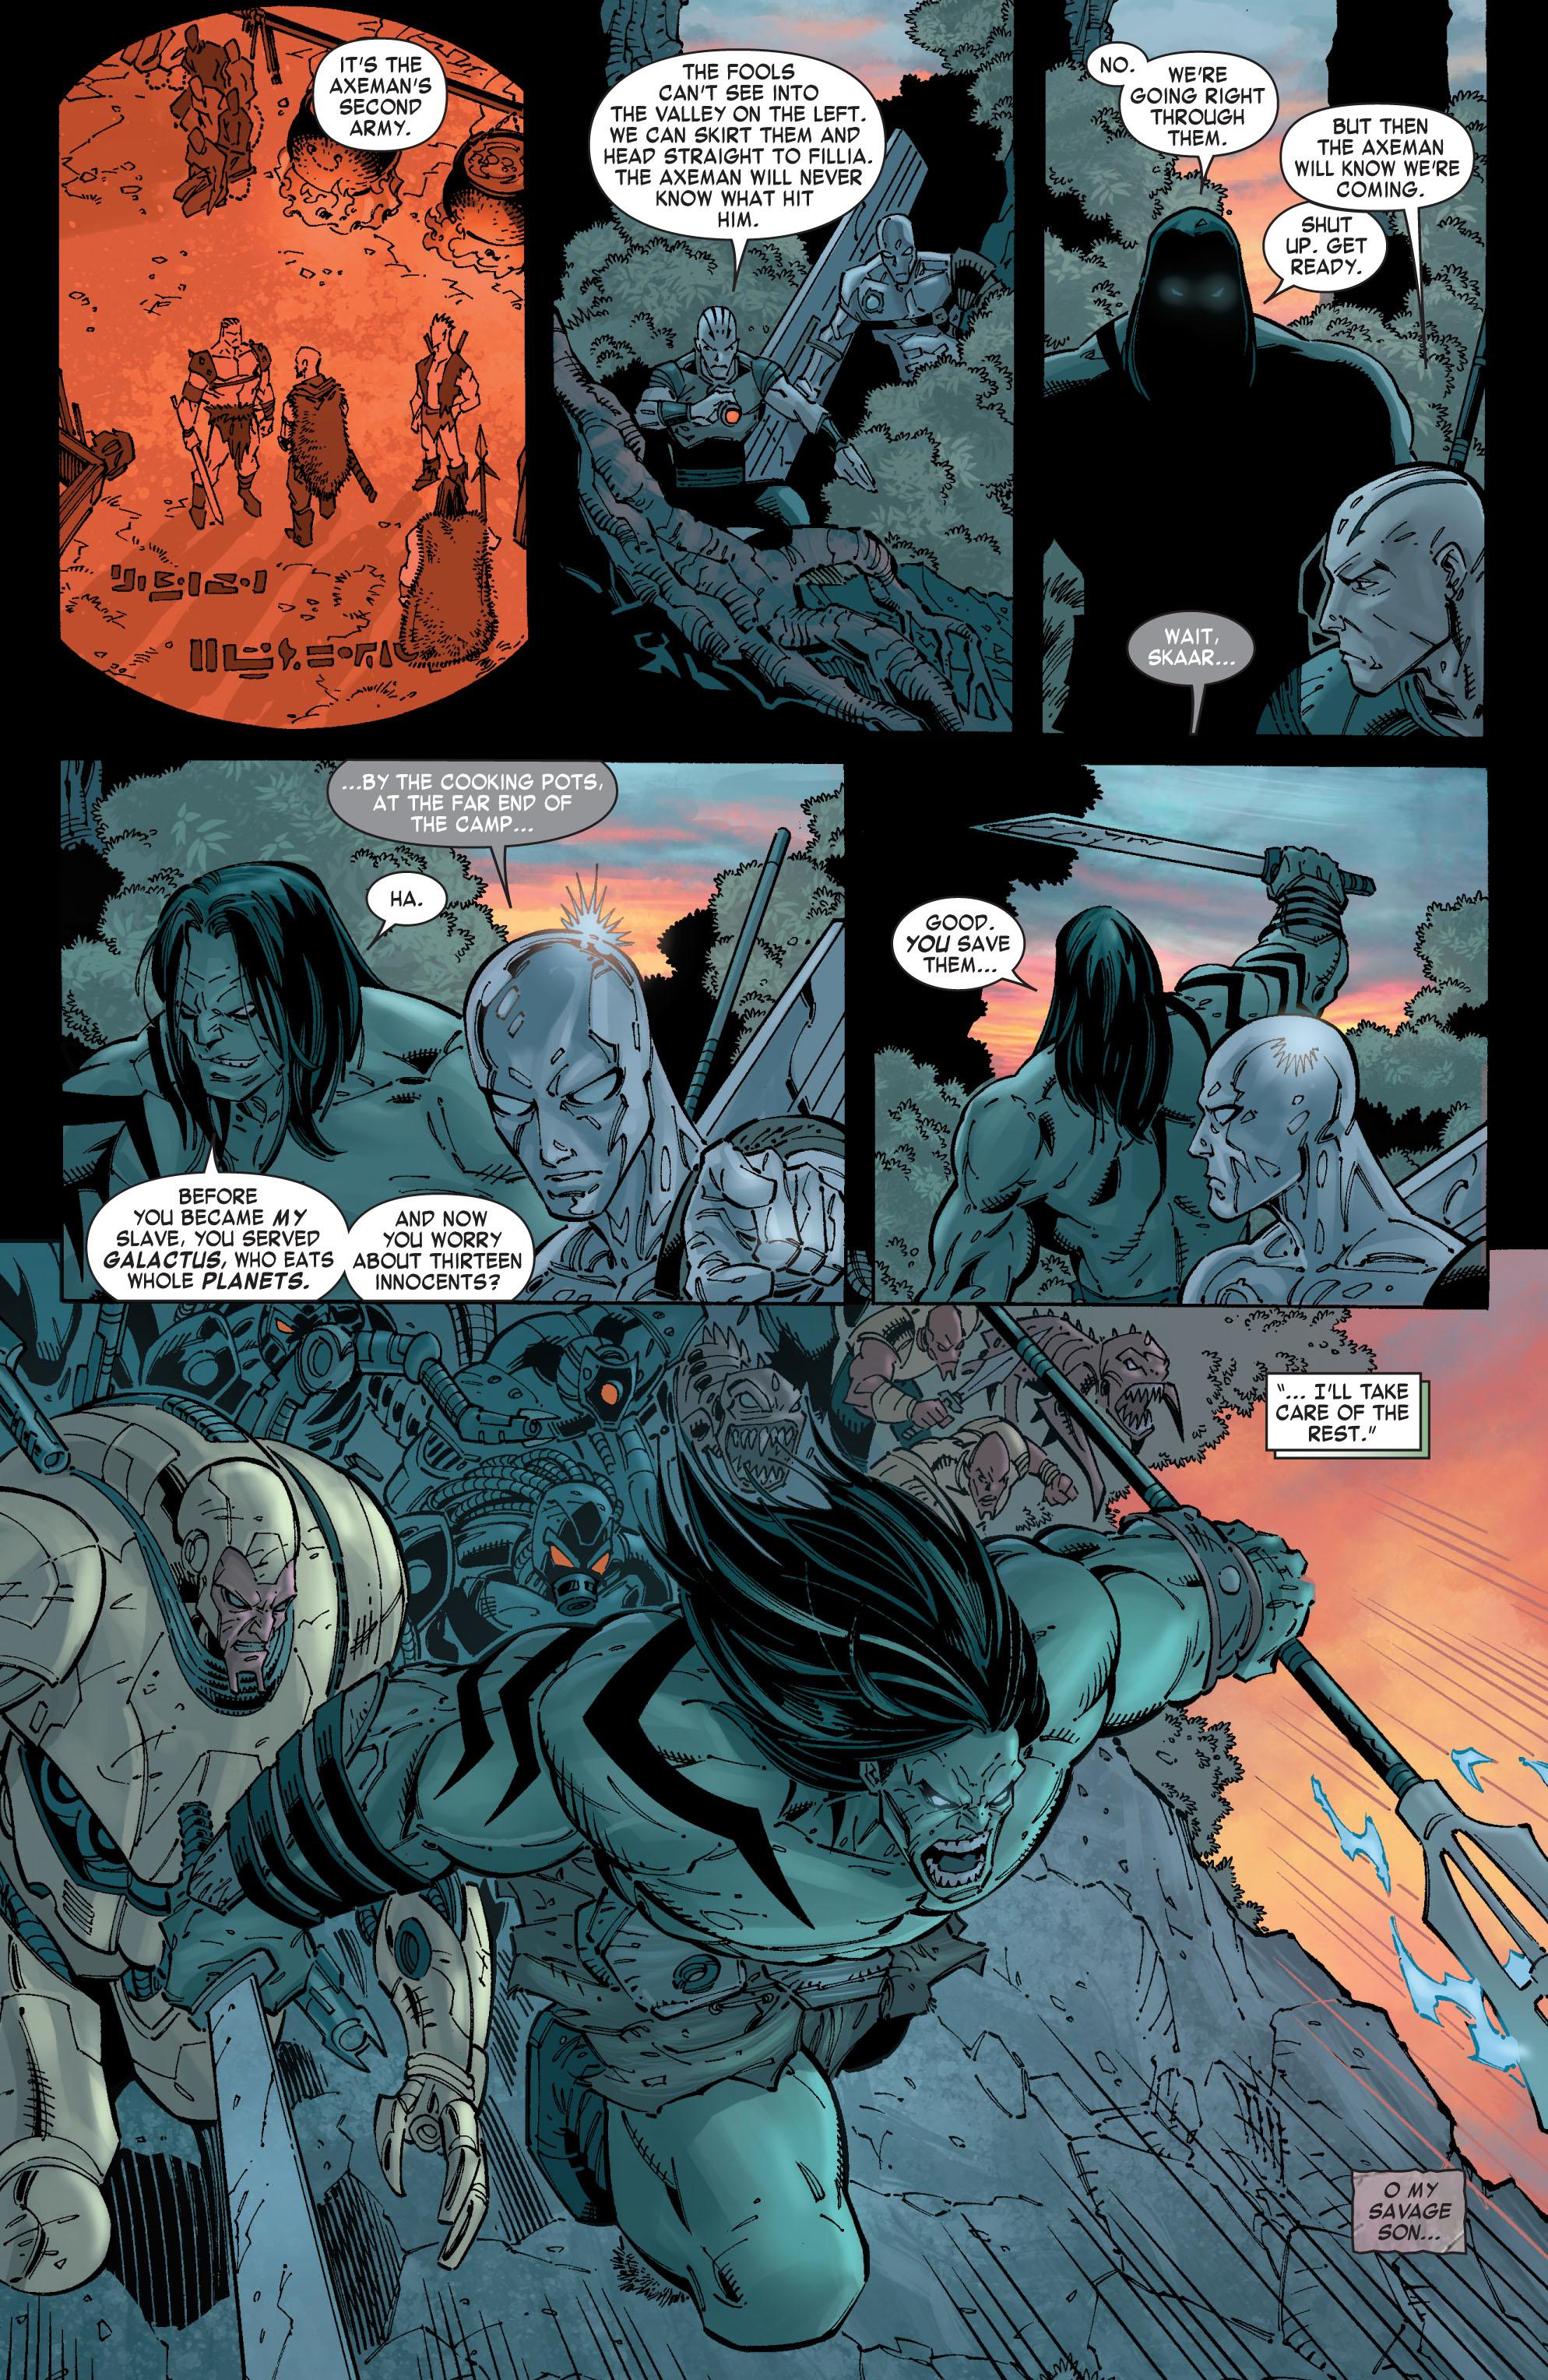 Read online Skaar: Son of Hulk comic -  Issue #8 - 10